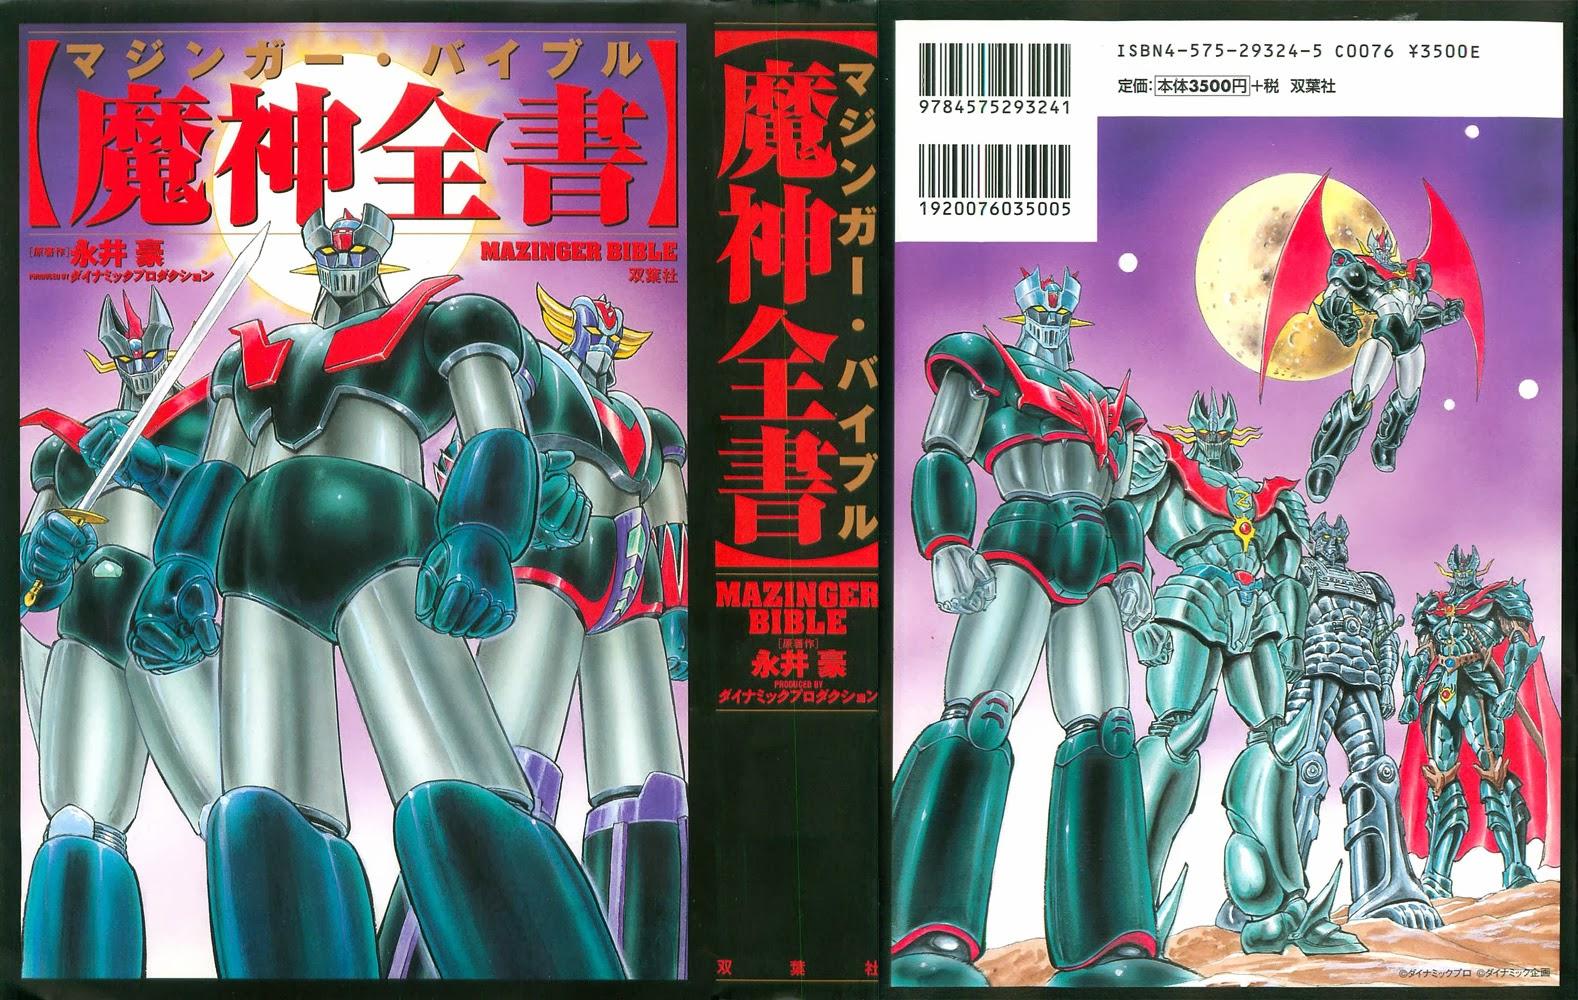 Nagai Go Mazinger Bible マジンガー・バイブル   Alternative